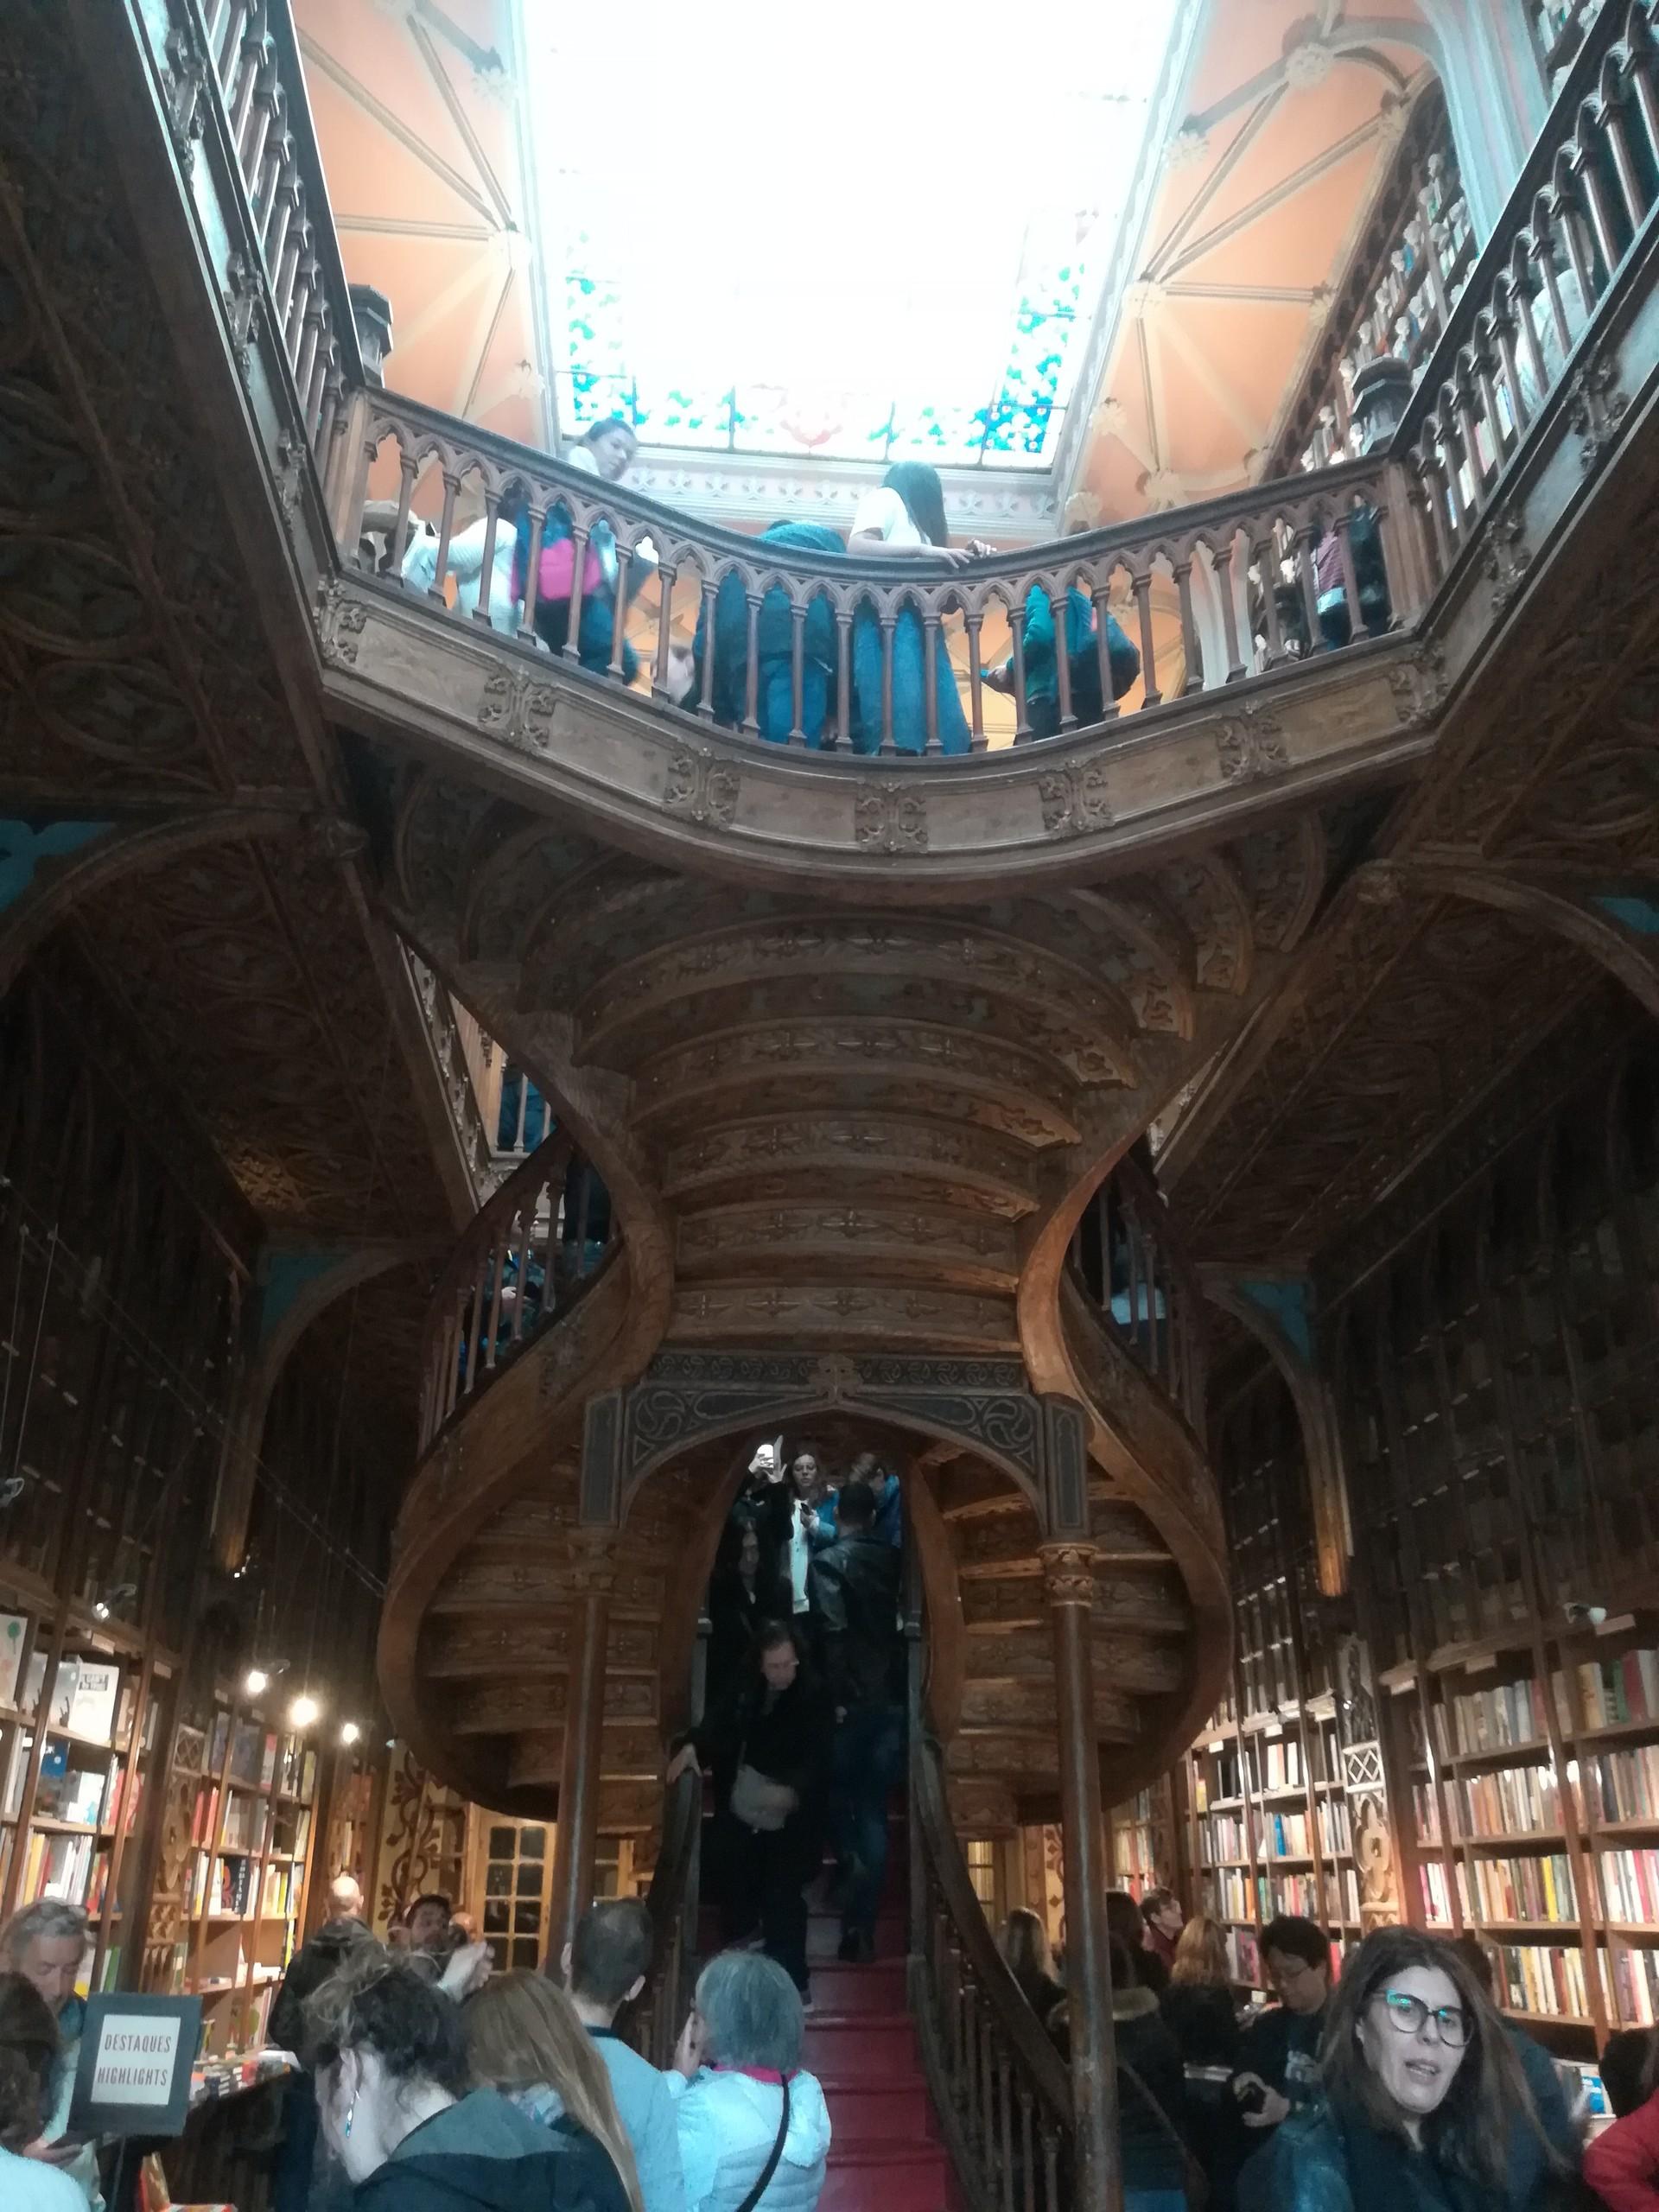 la-librairie-inspire-j-k-rowlings-46f14e32434fa5bcba4e2bbd7649204e.jpg